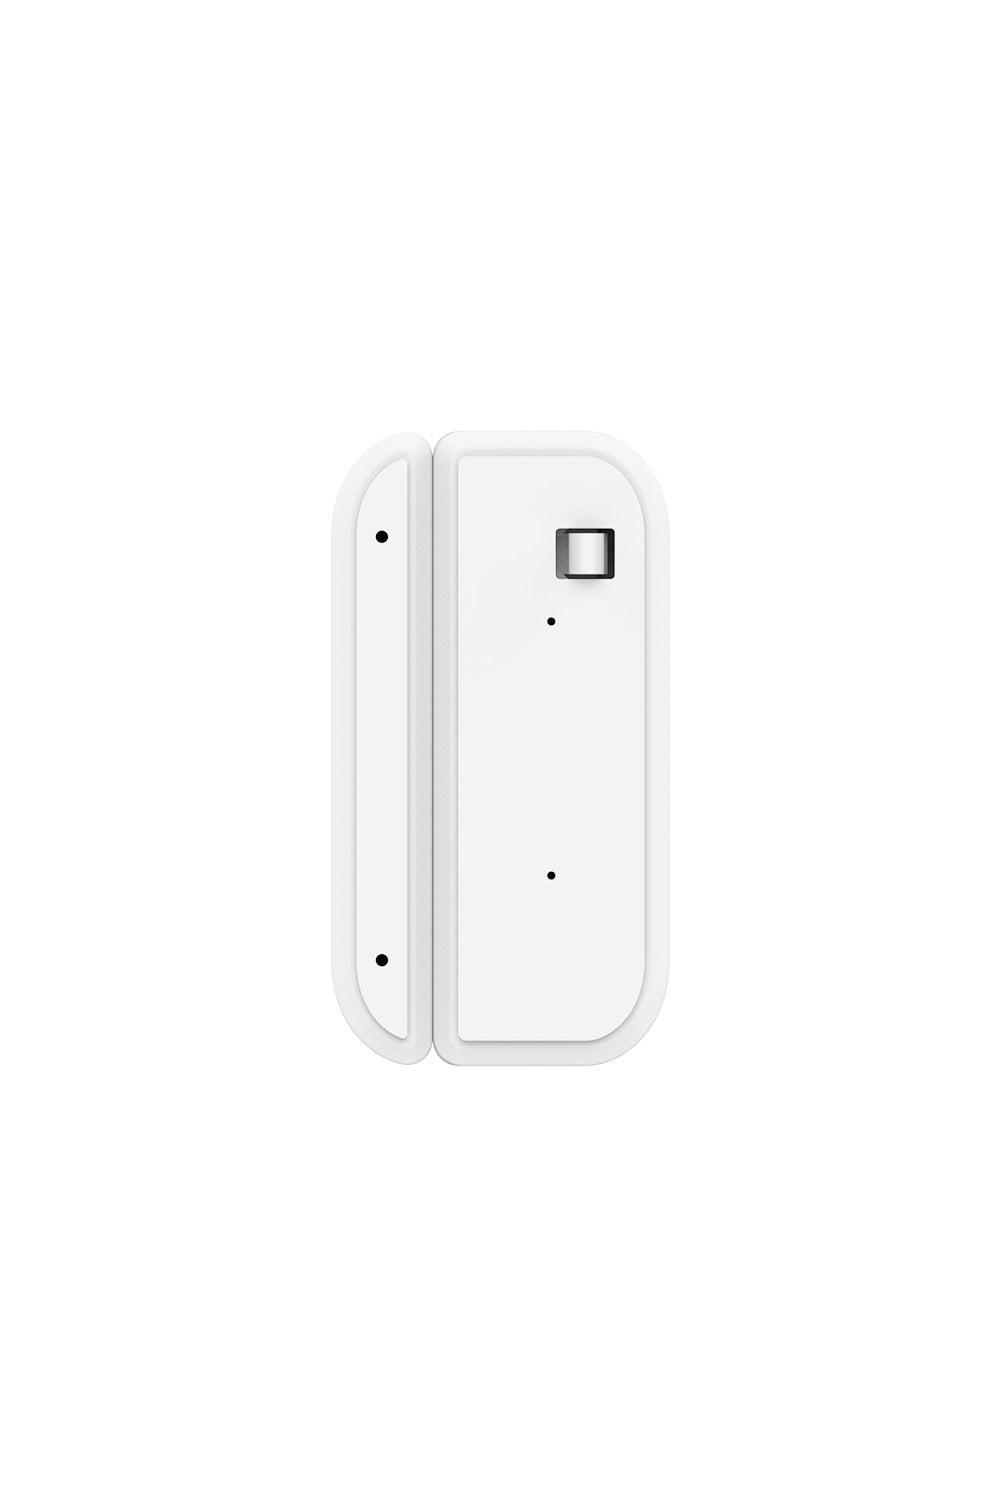 Woox R4966 - Kabellos - WLAN - Weiß - 2400 MHz - Door/Window - 10 m